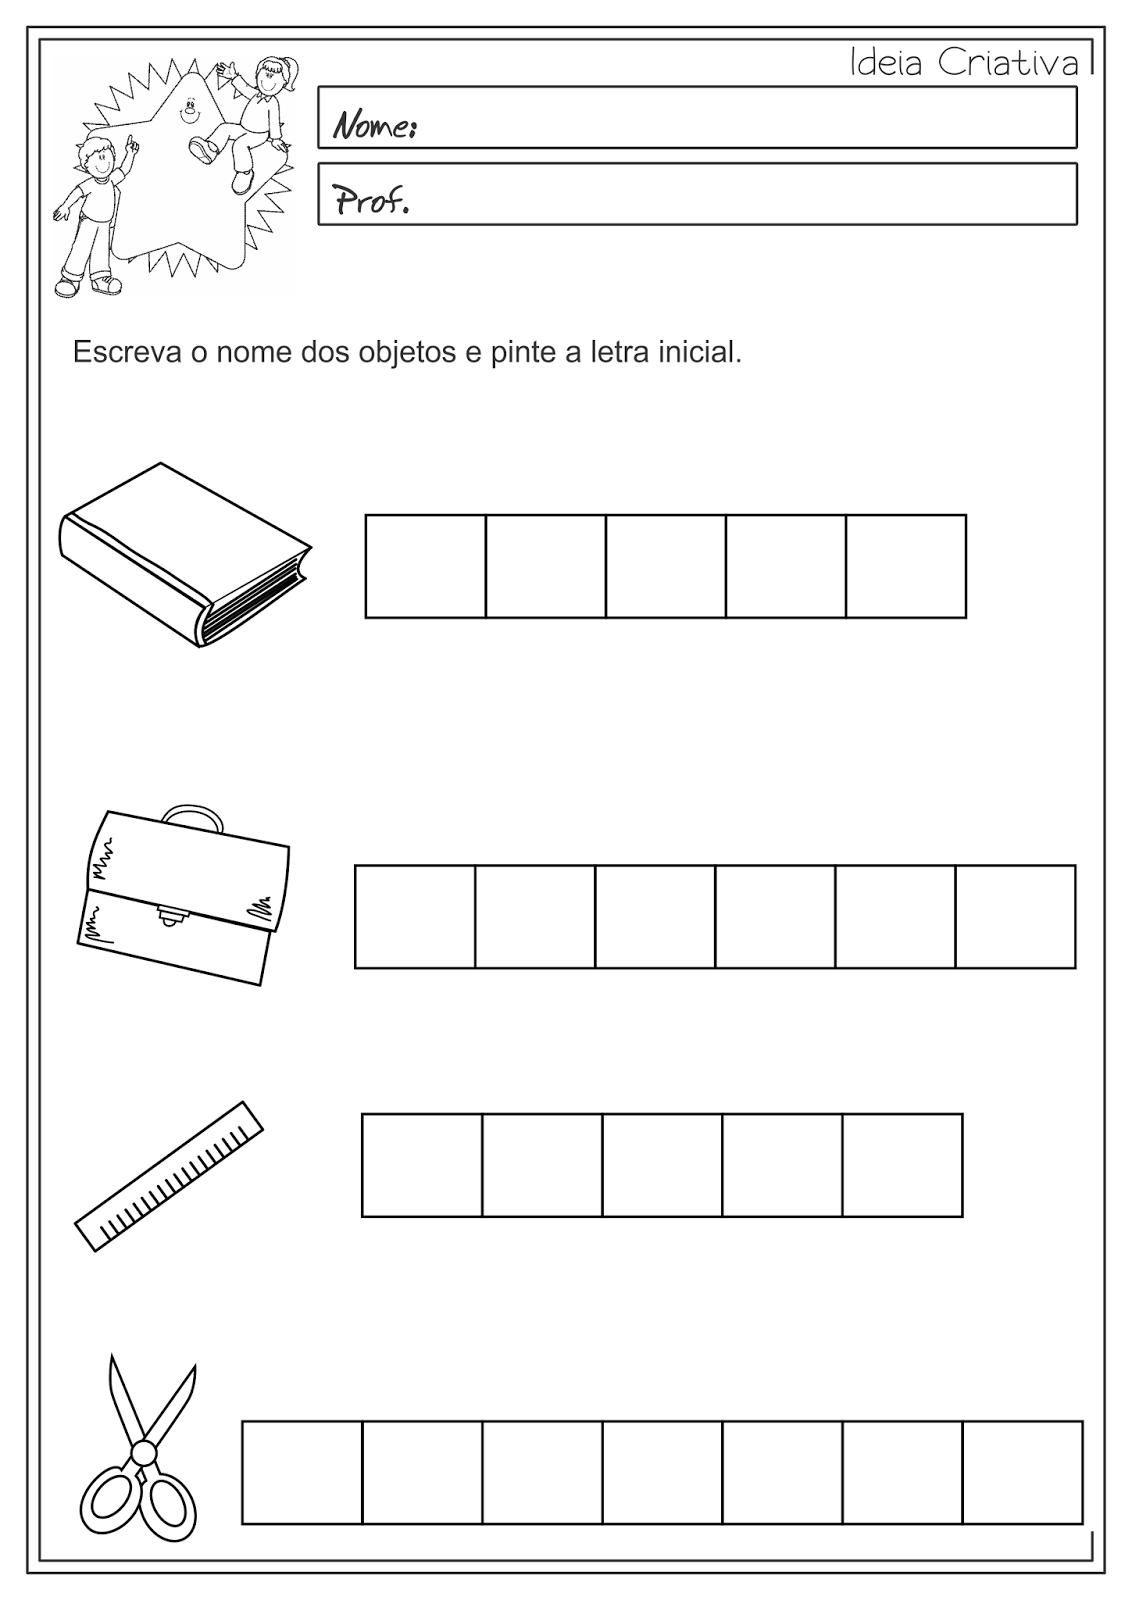 Atividades Educativas Letra Inicial das Palavras Língua Portuguesa 3° ano Fundamental